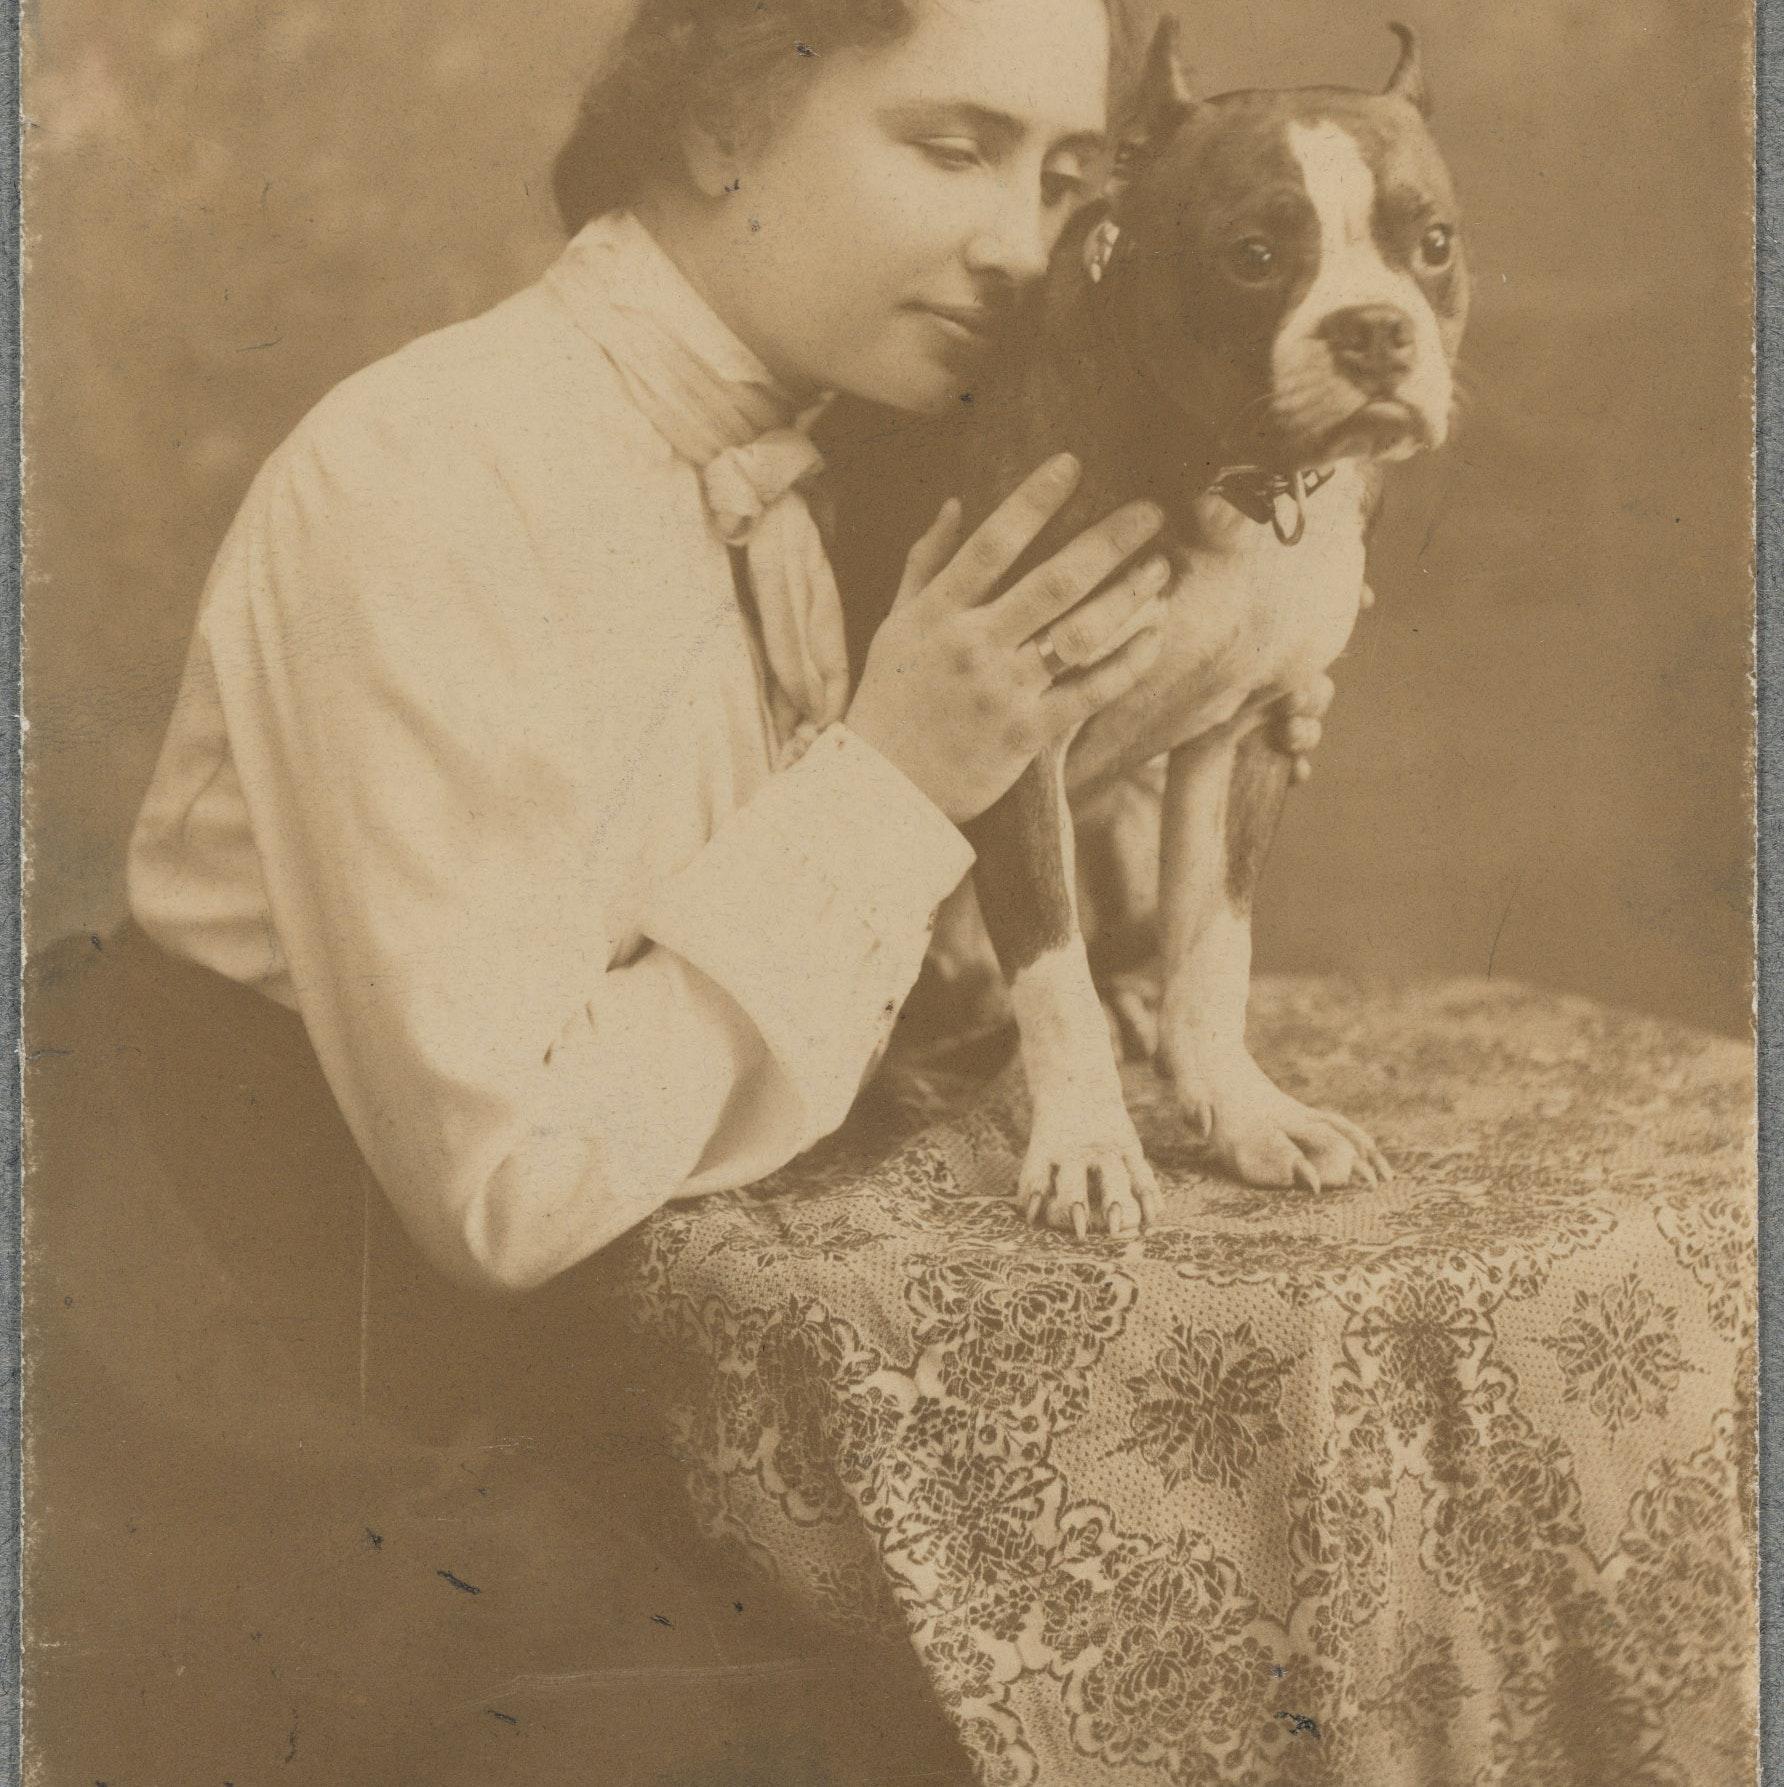 Helen Keller posing with her dog